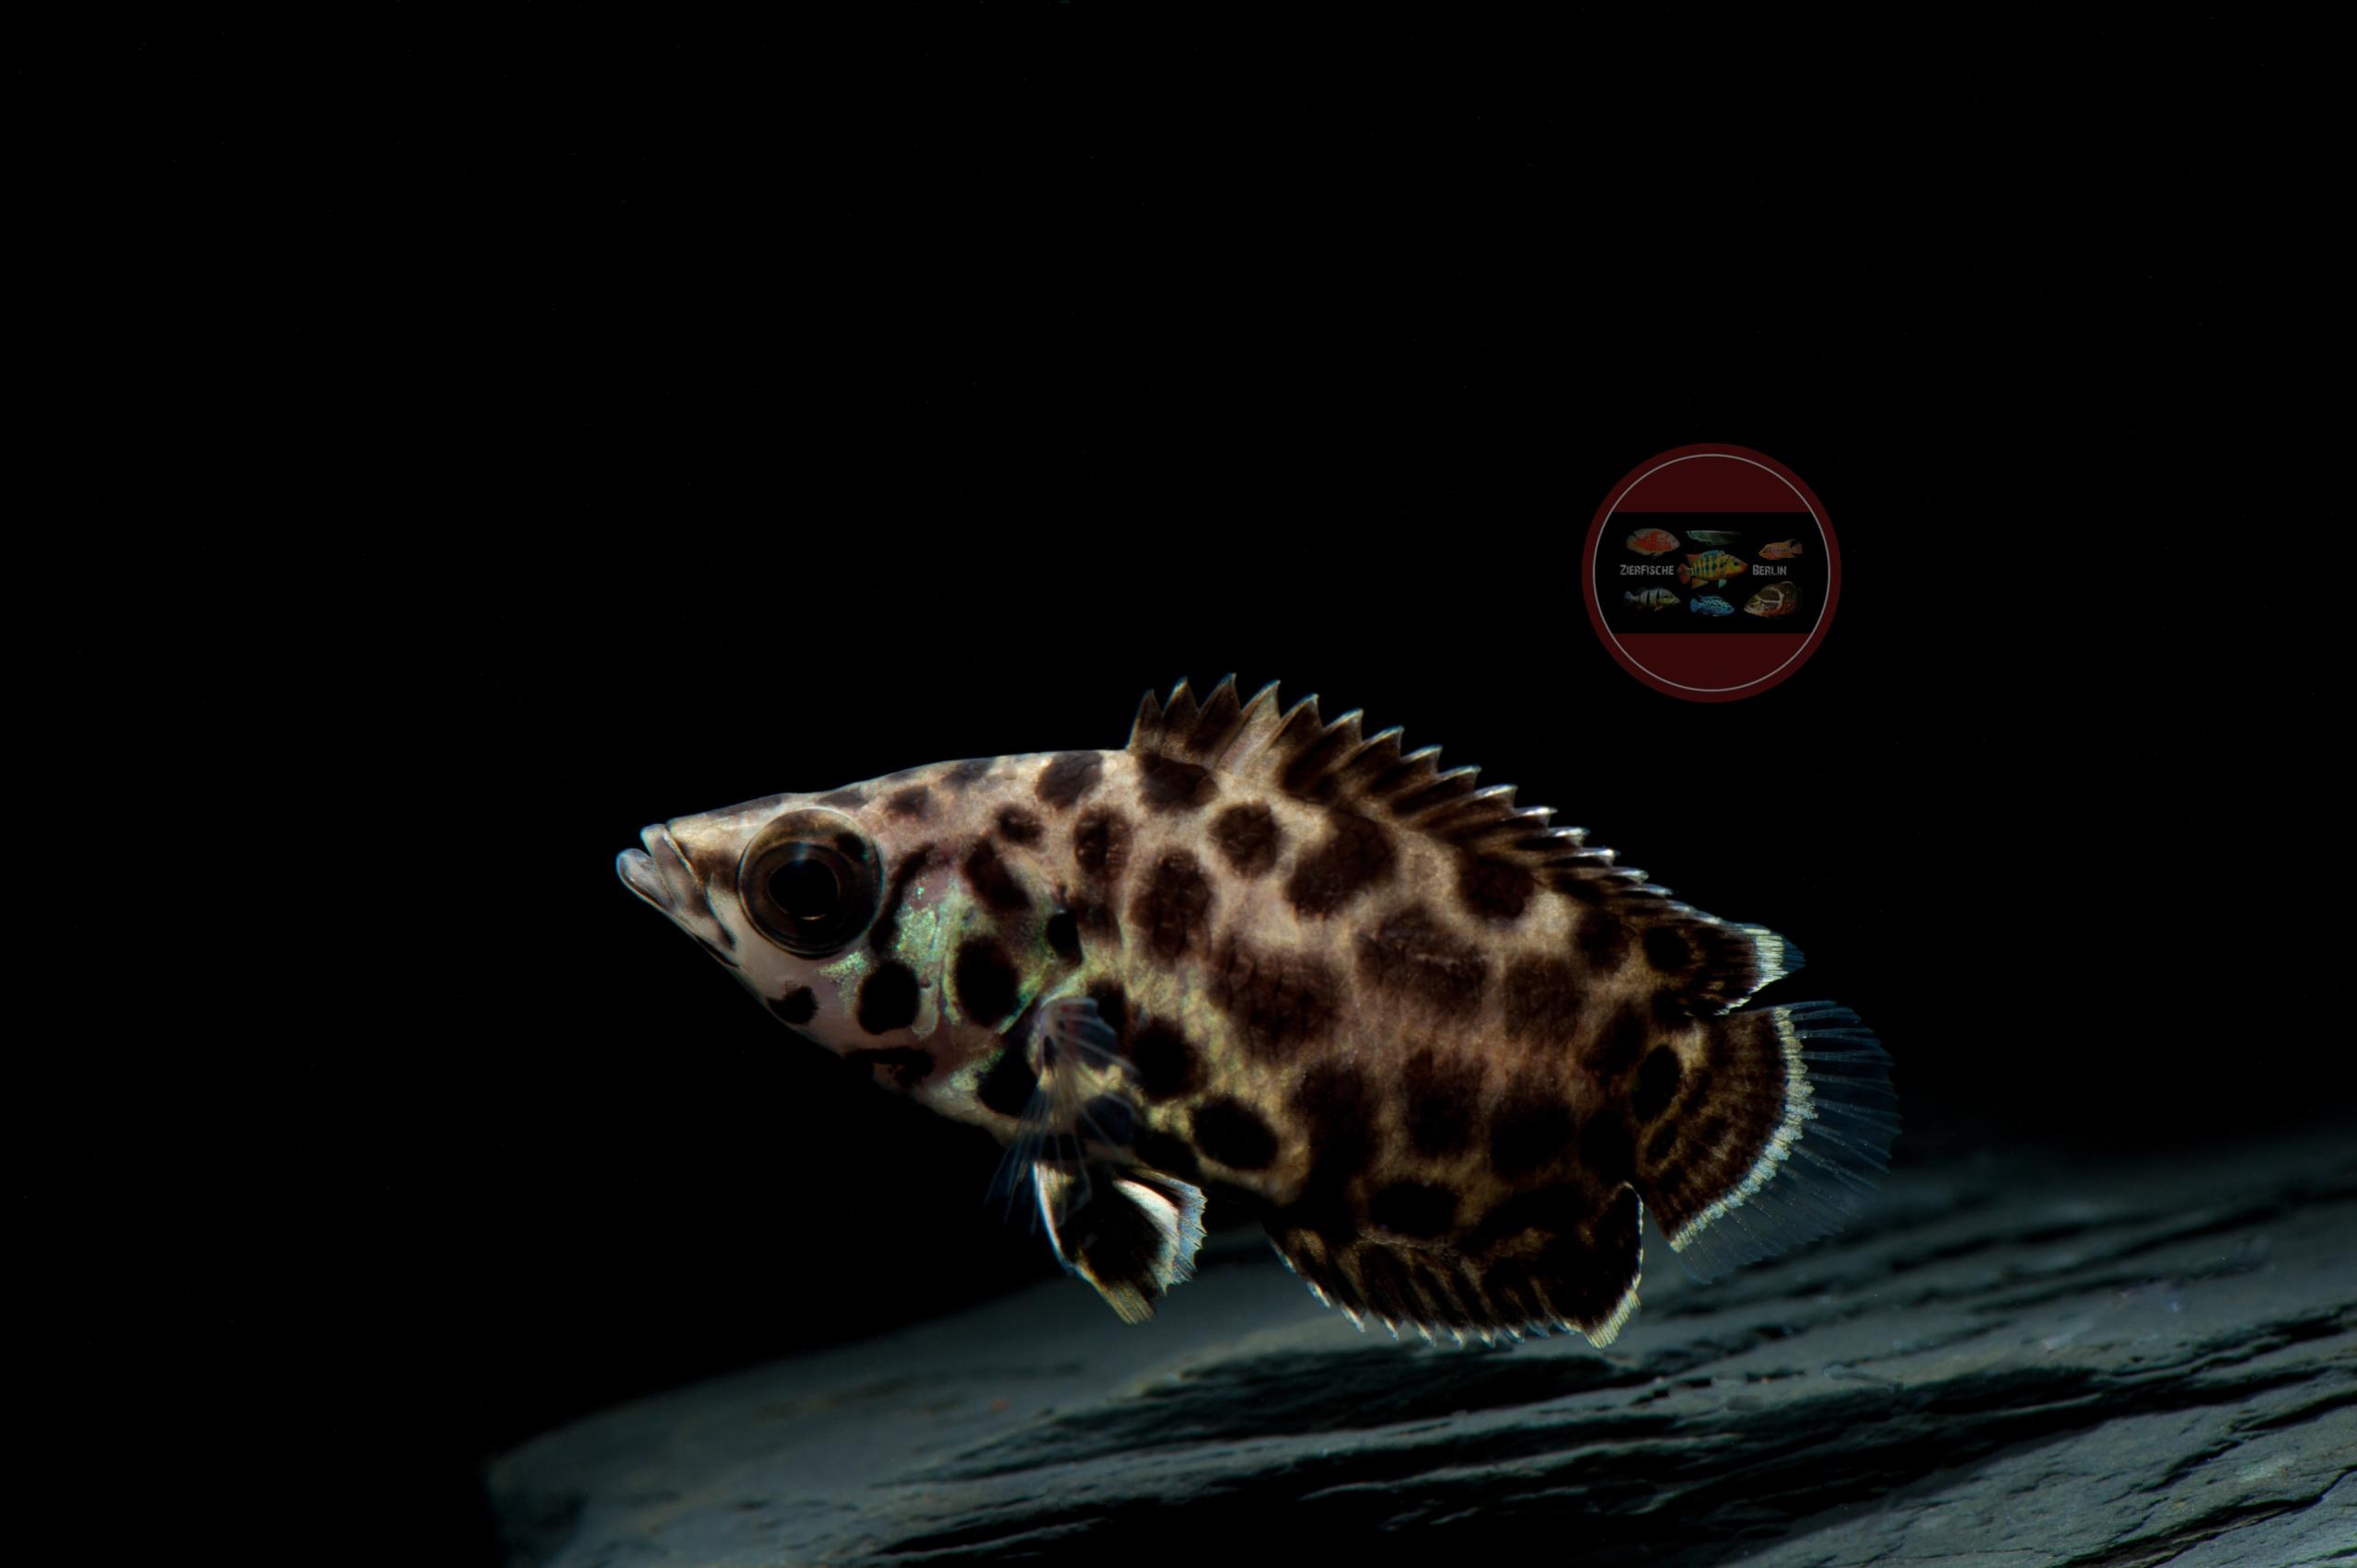 Leopard-Buschfisch Ctenopoma acutirostre